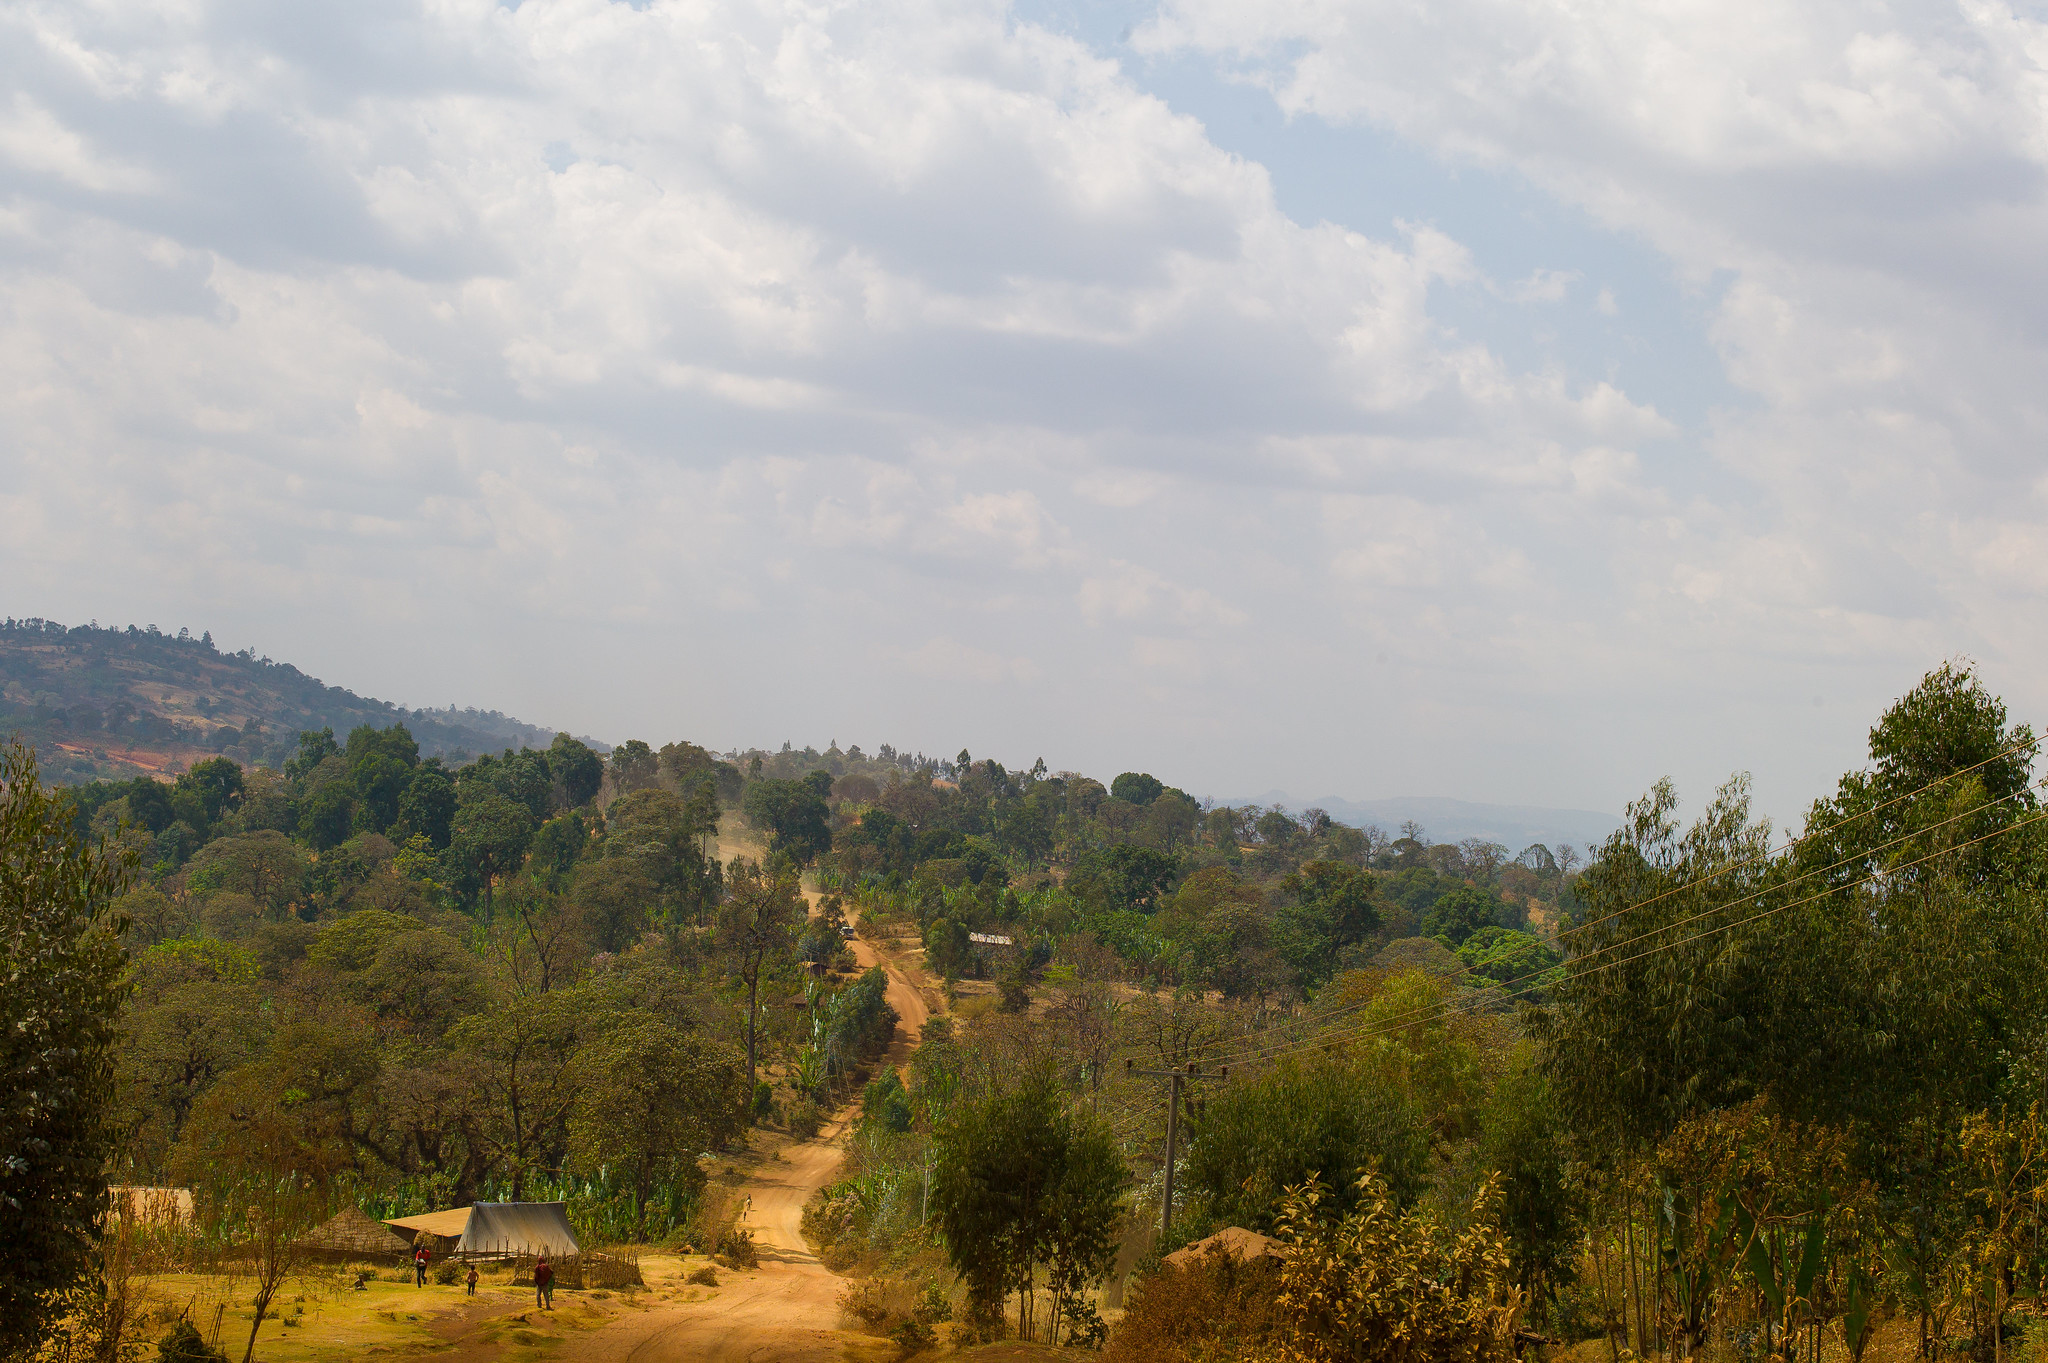 The road to Benti Nenqa